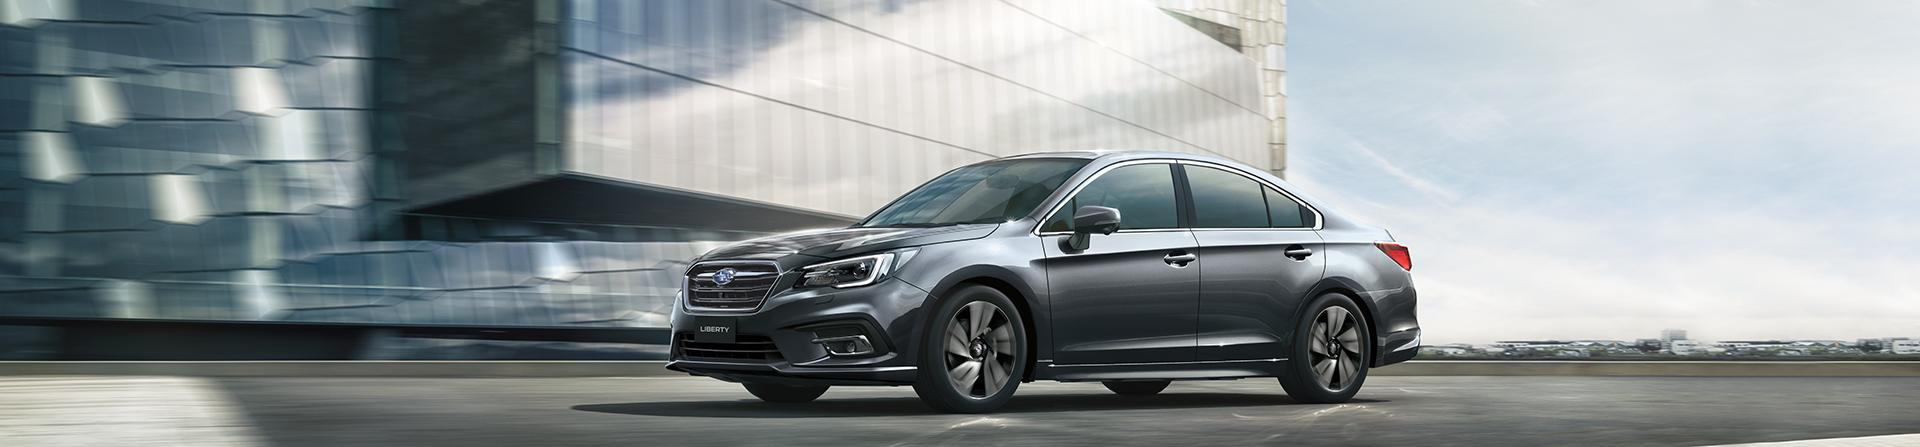 Subaru Liberty Image 1